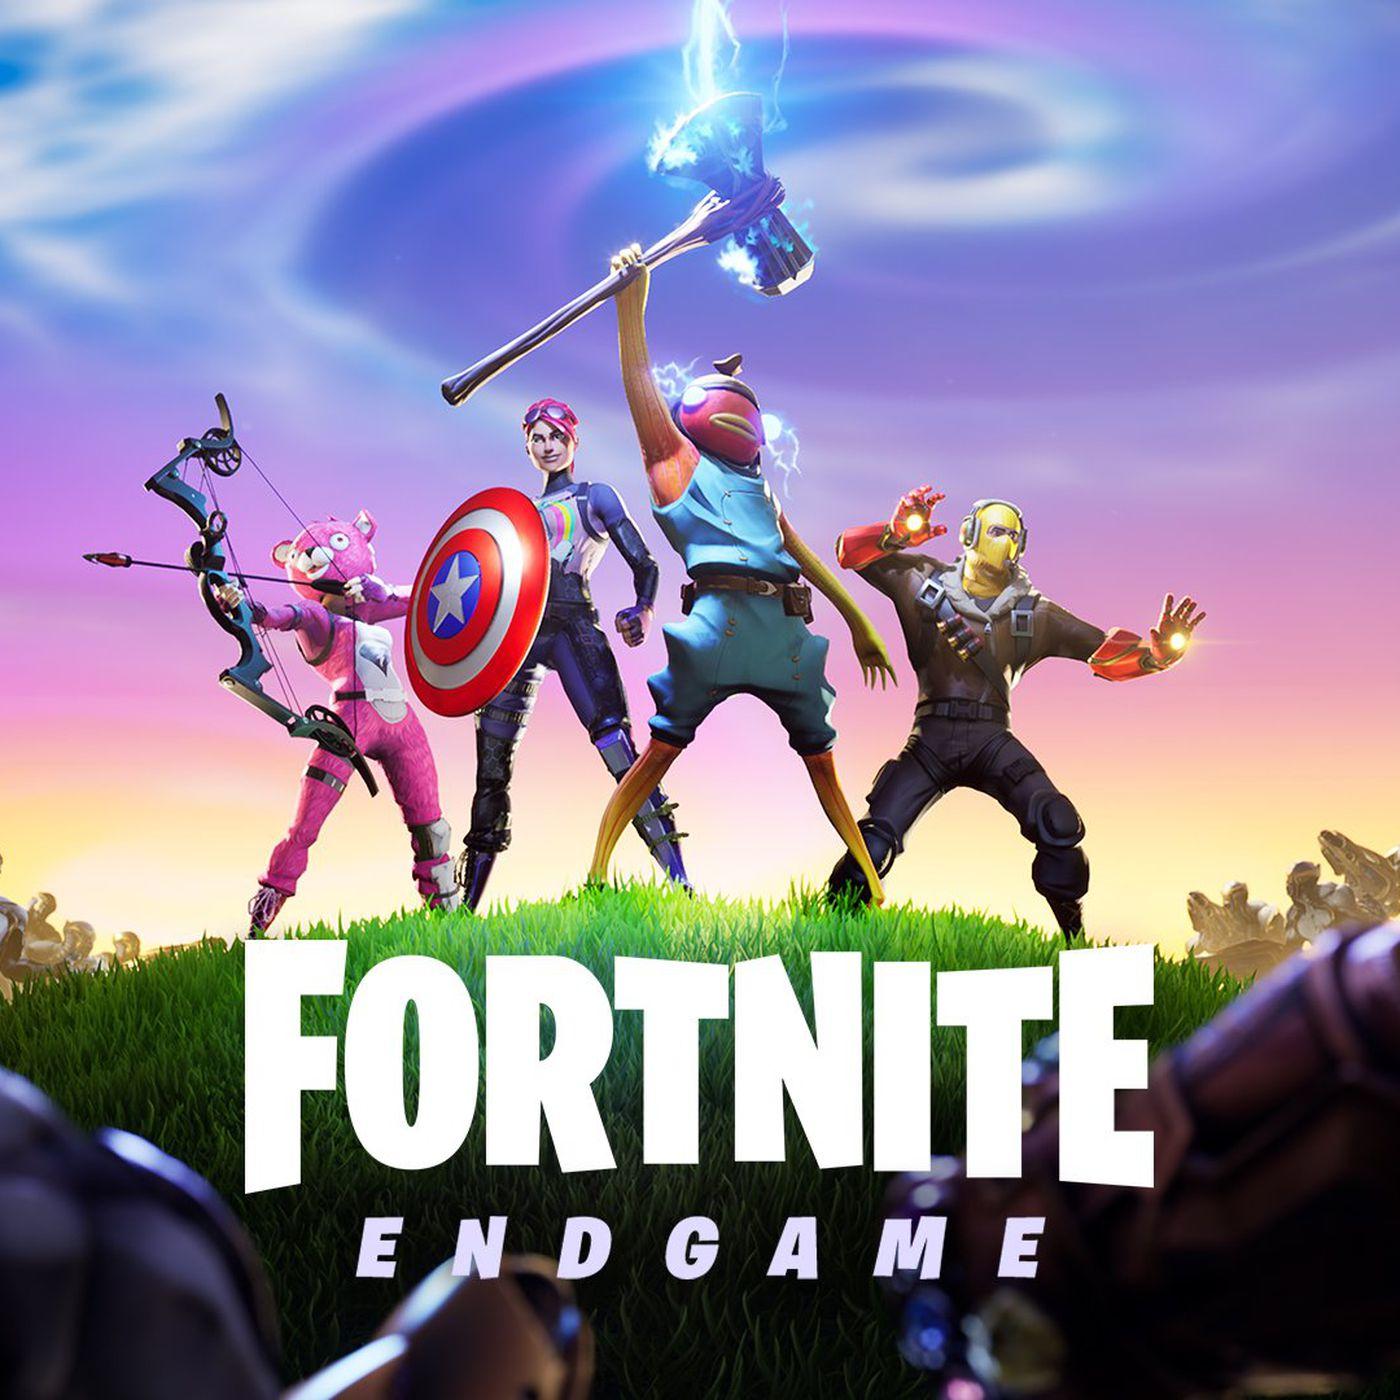 Fortnite S Avengers Endgame Crossover Is One Of The Best